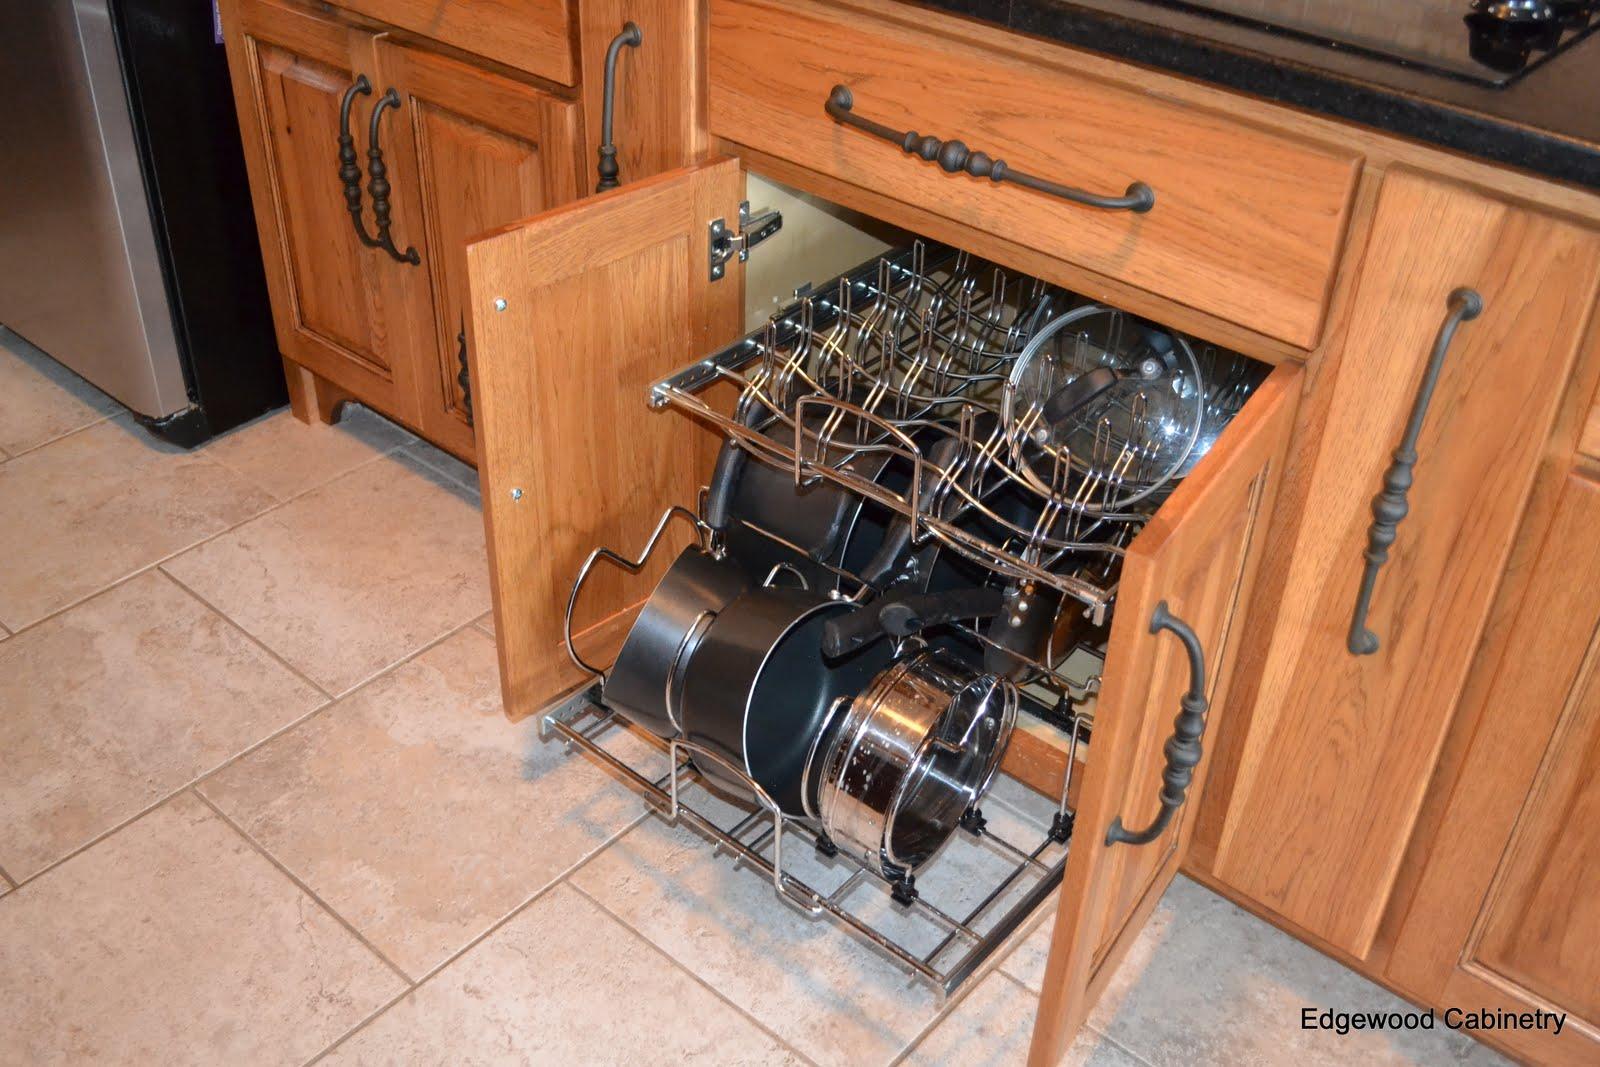 edgewood cabinetry pot pan storage